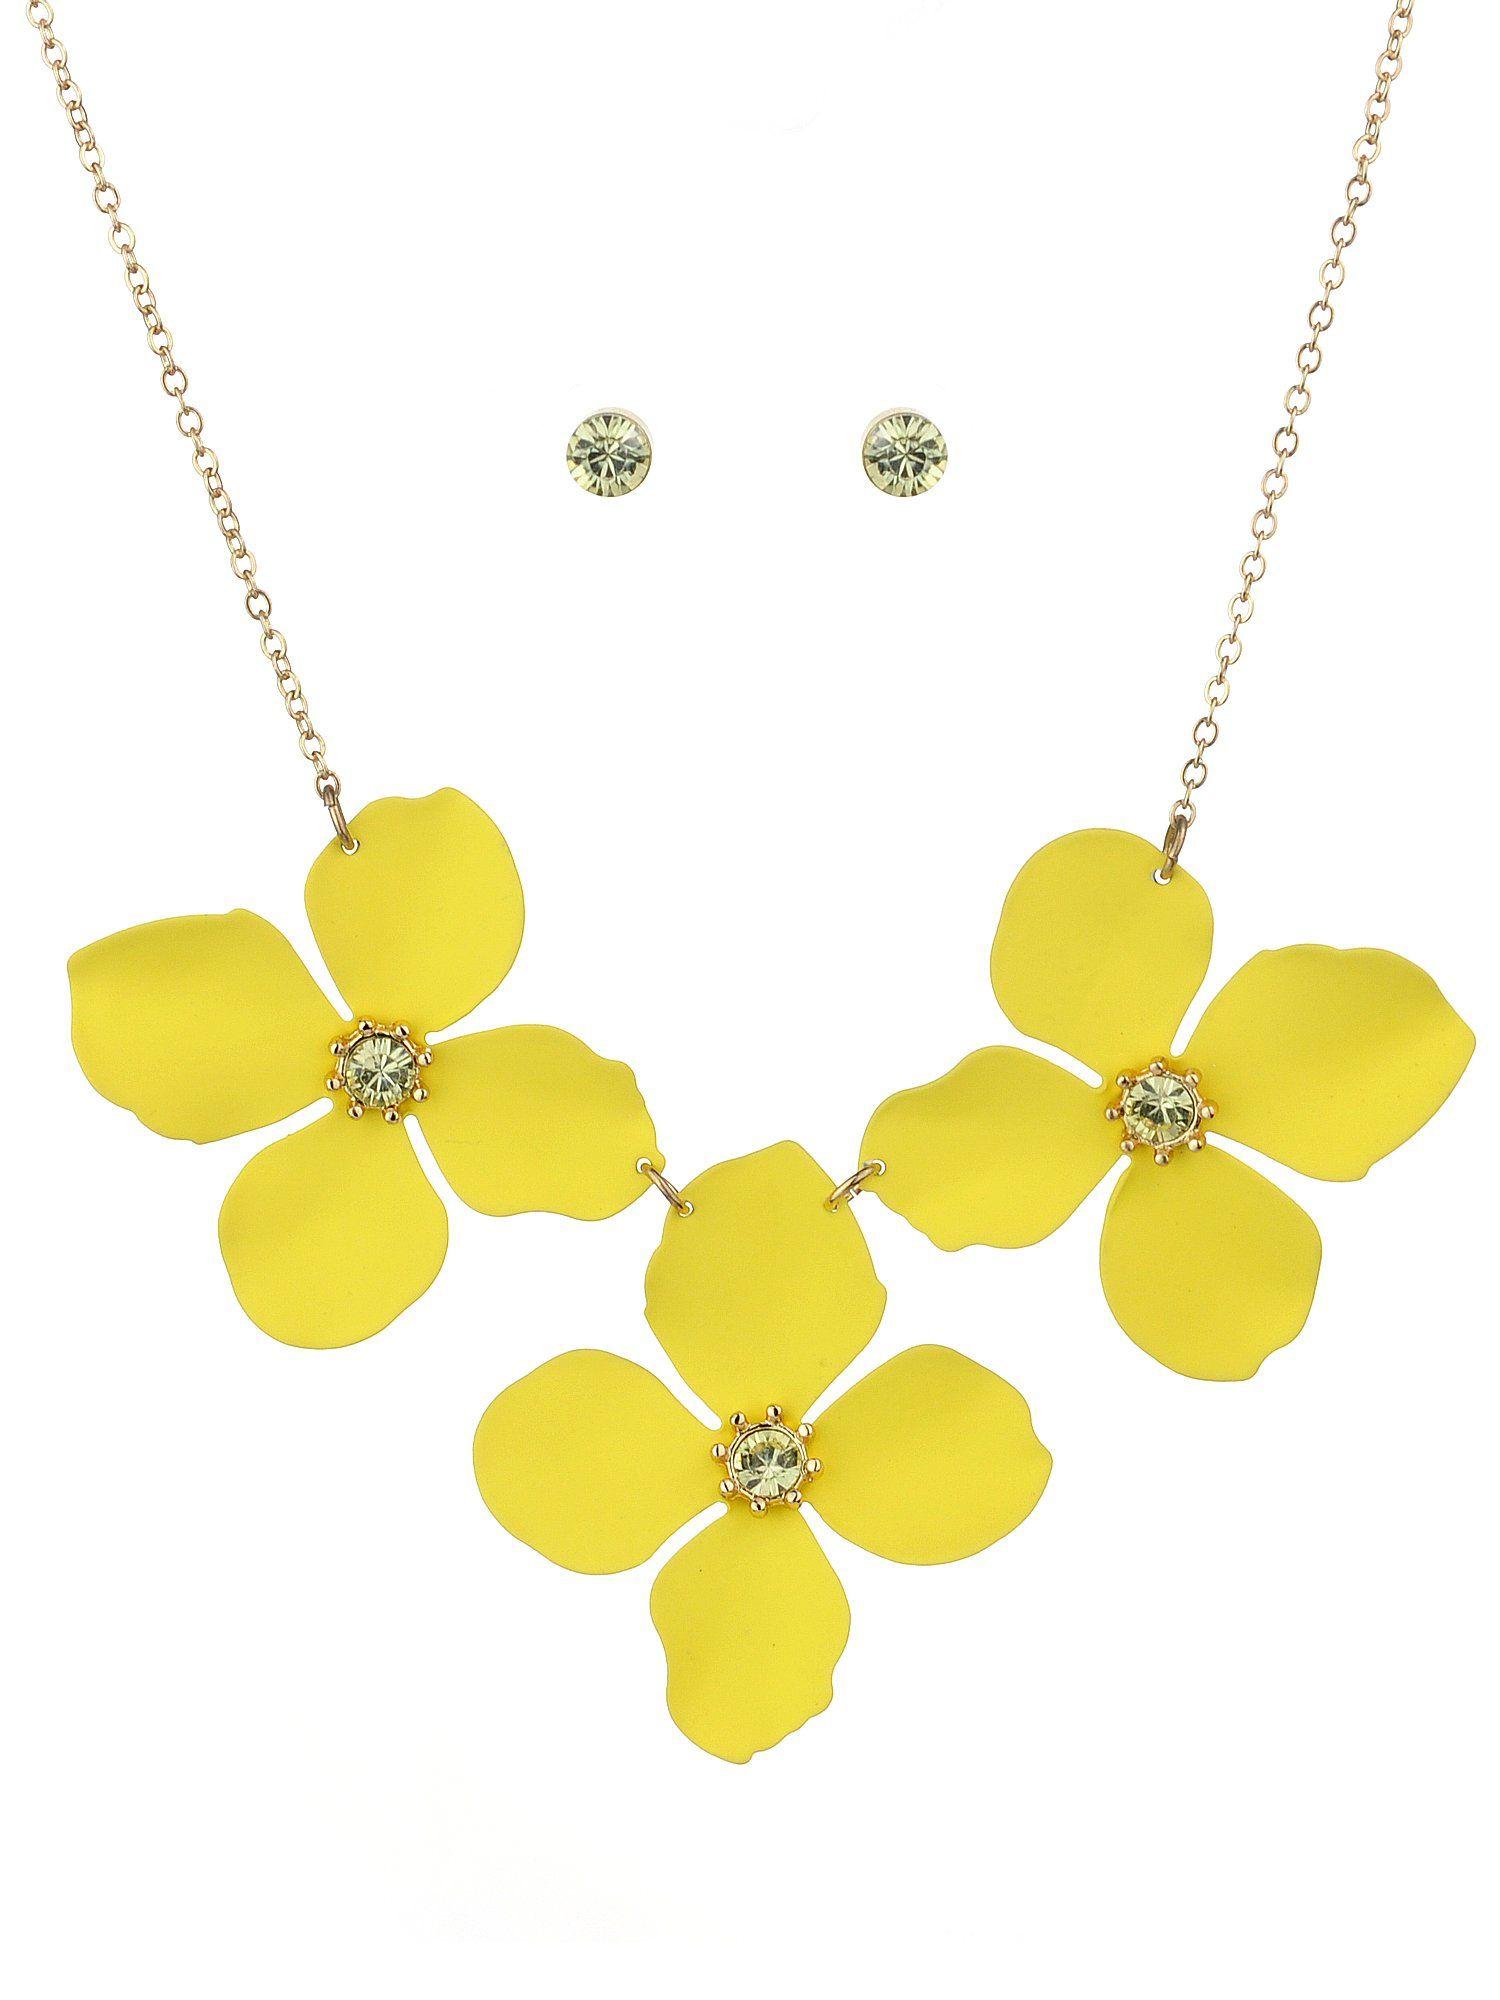 NYFASHION101 Womens Matte Flower Petal Necklace and Stud